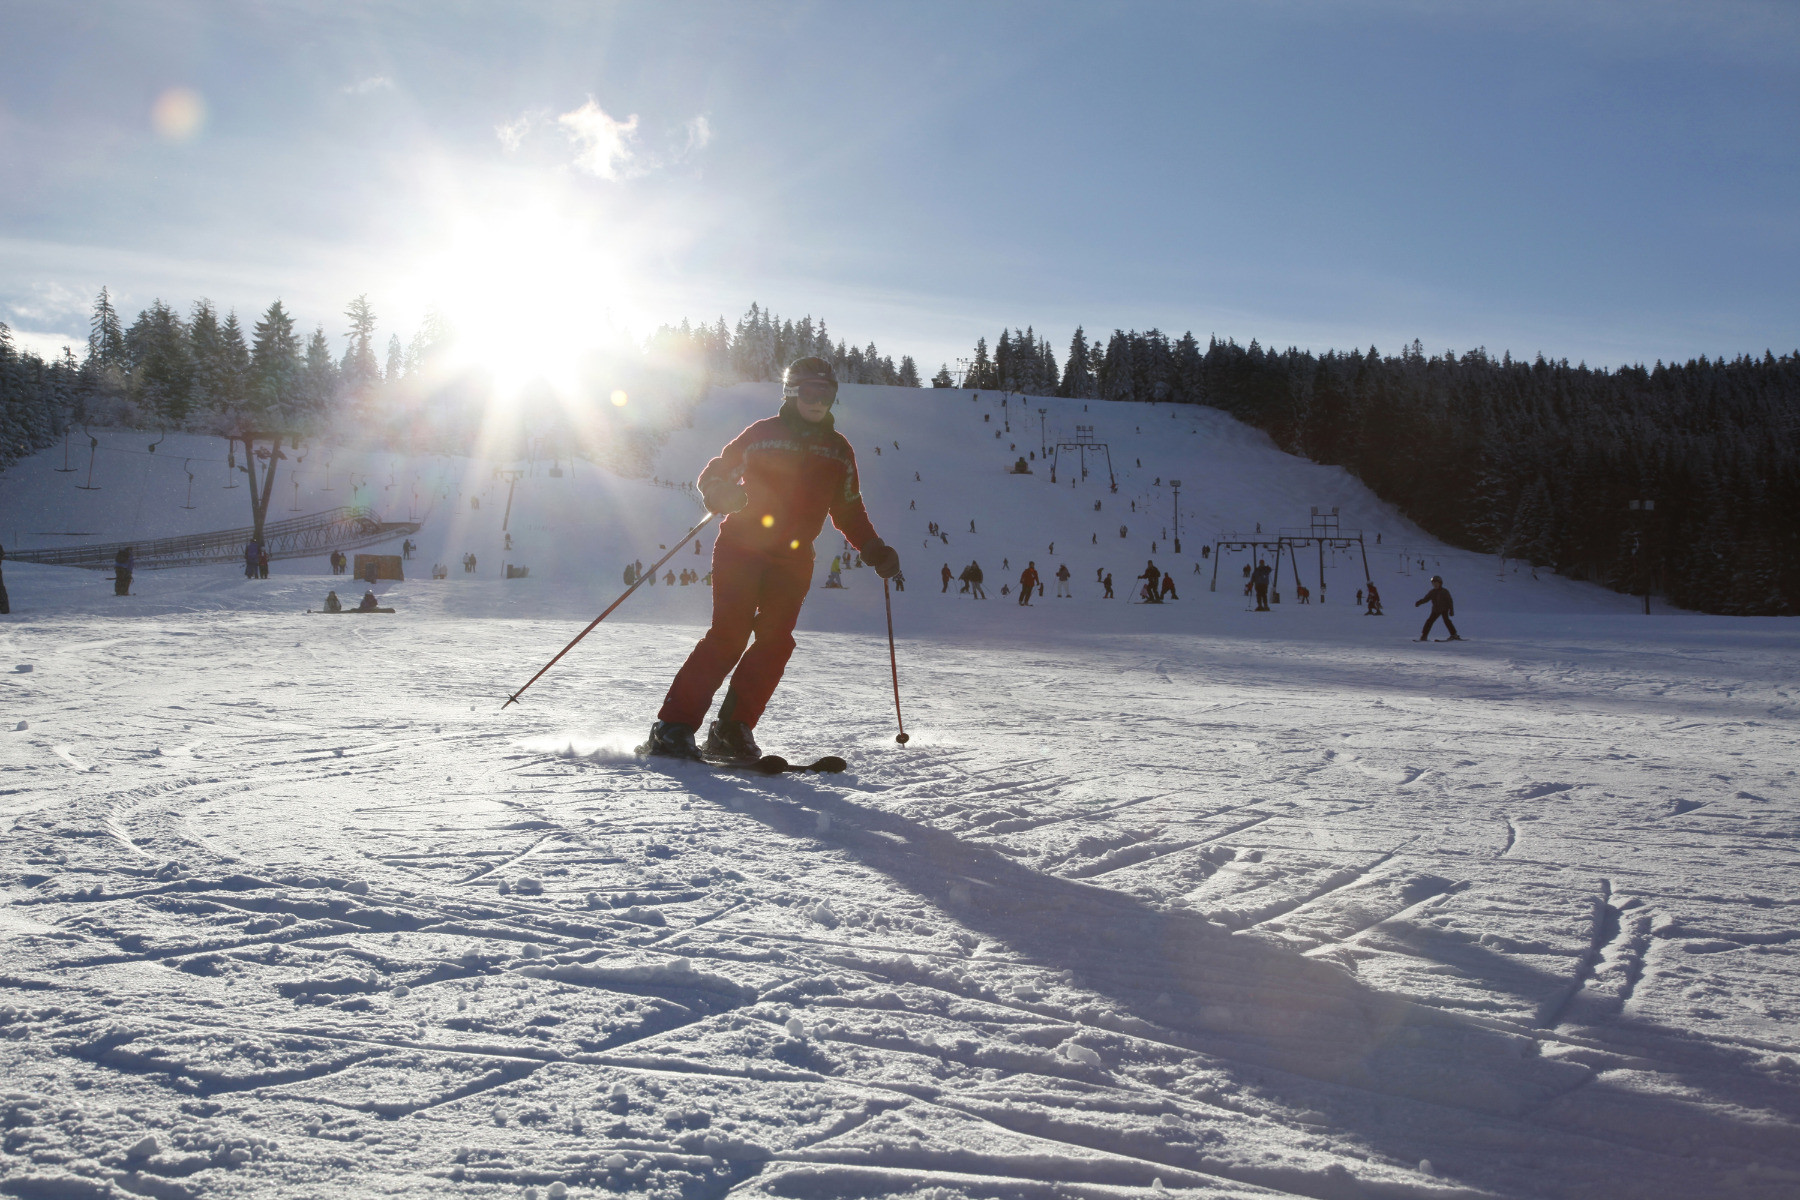 Wintersportregion Murgtal/Bühlertalundefined